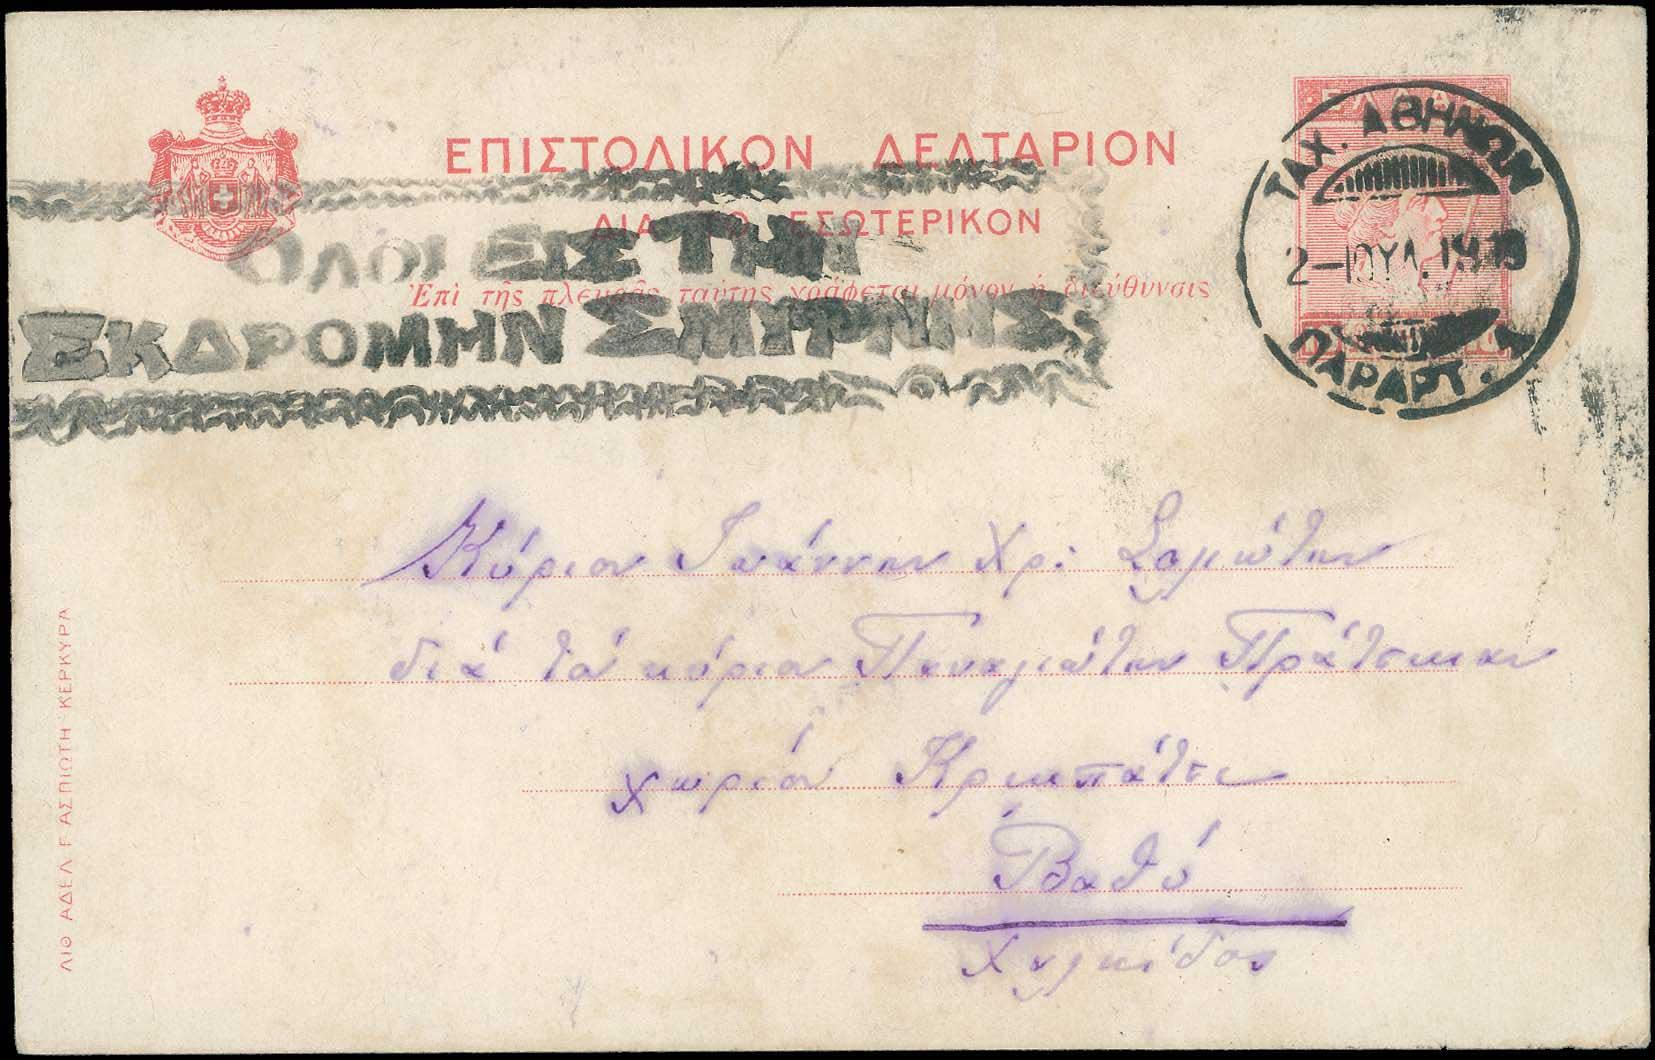 Lot 866 - -  SMYRNE,CONS/PLE & ASIA MINOR (before 1922) SMYRNE,CONS/PLE & ASIA MINOR (before 1922) -  A. Karamitsos Public & Live Internet Auction 675